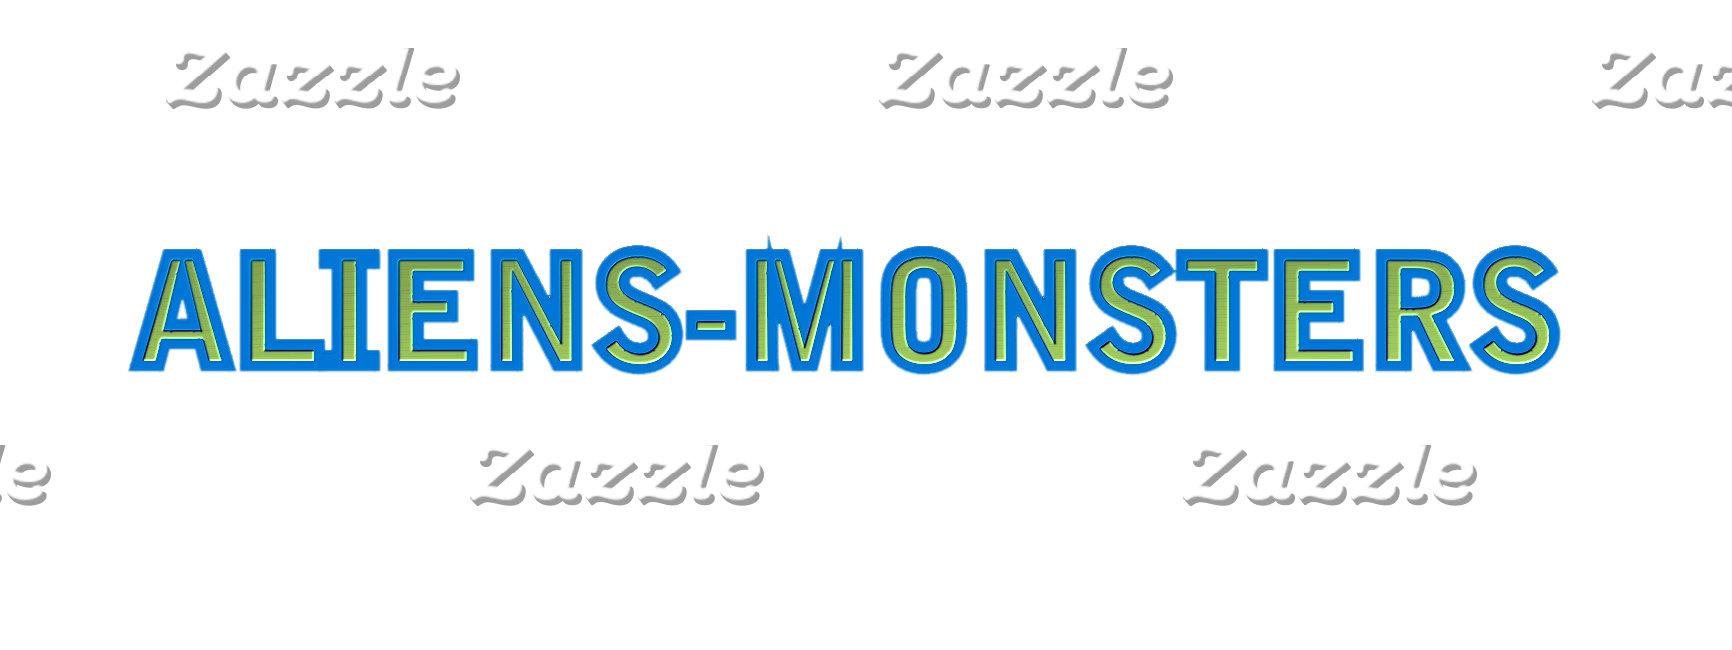 Alien - Monsters